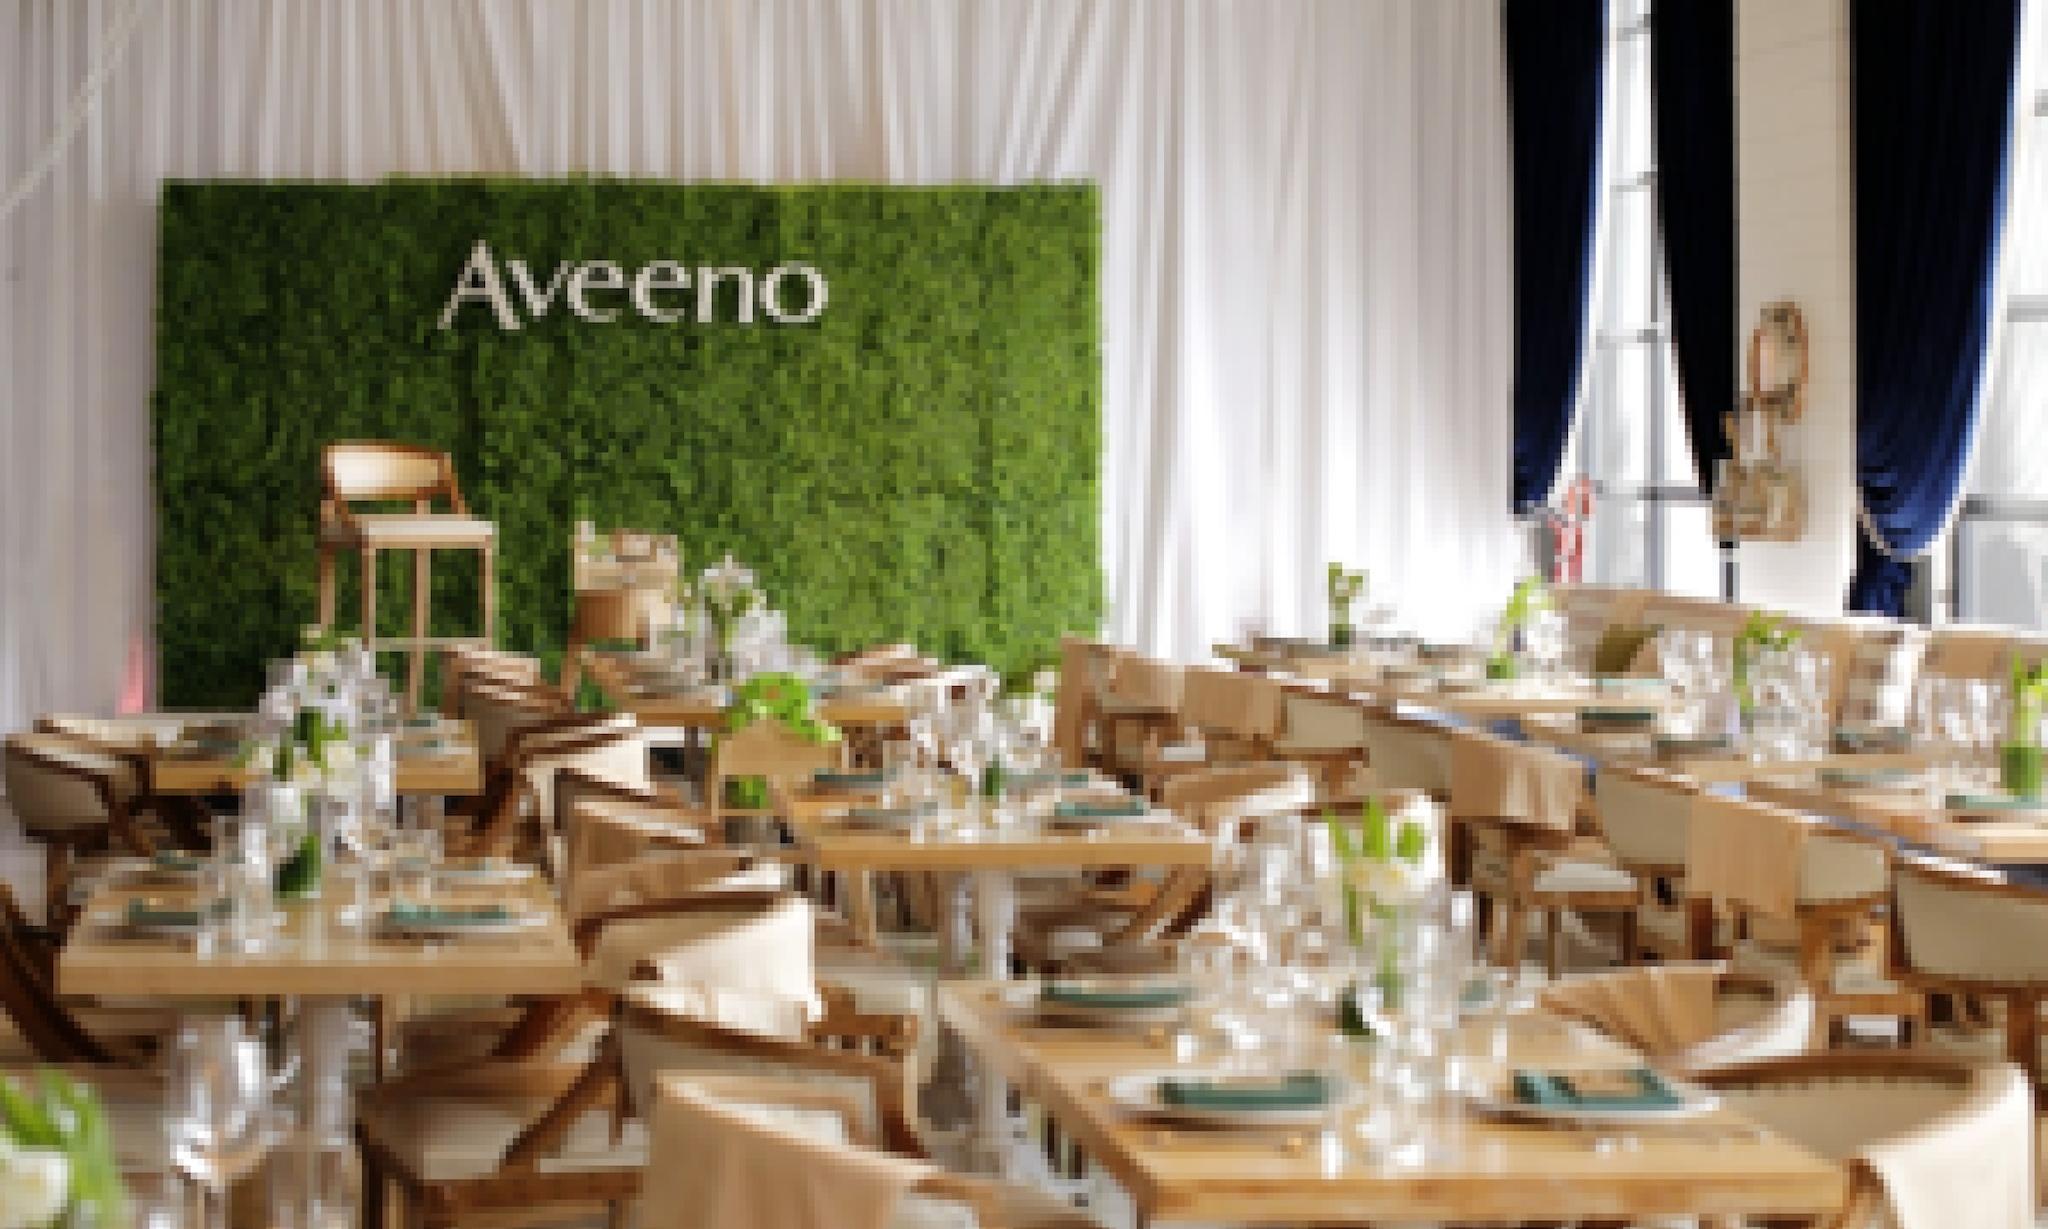 Aveeno sign on ivy wall